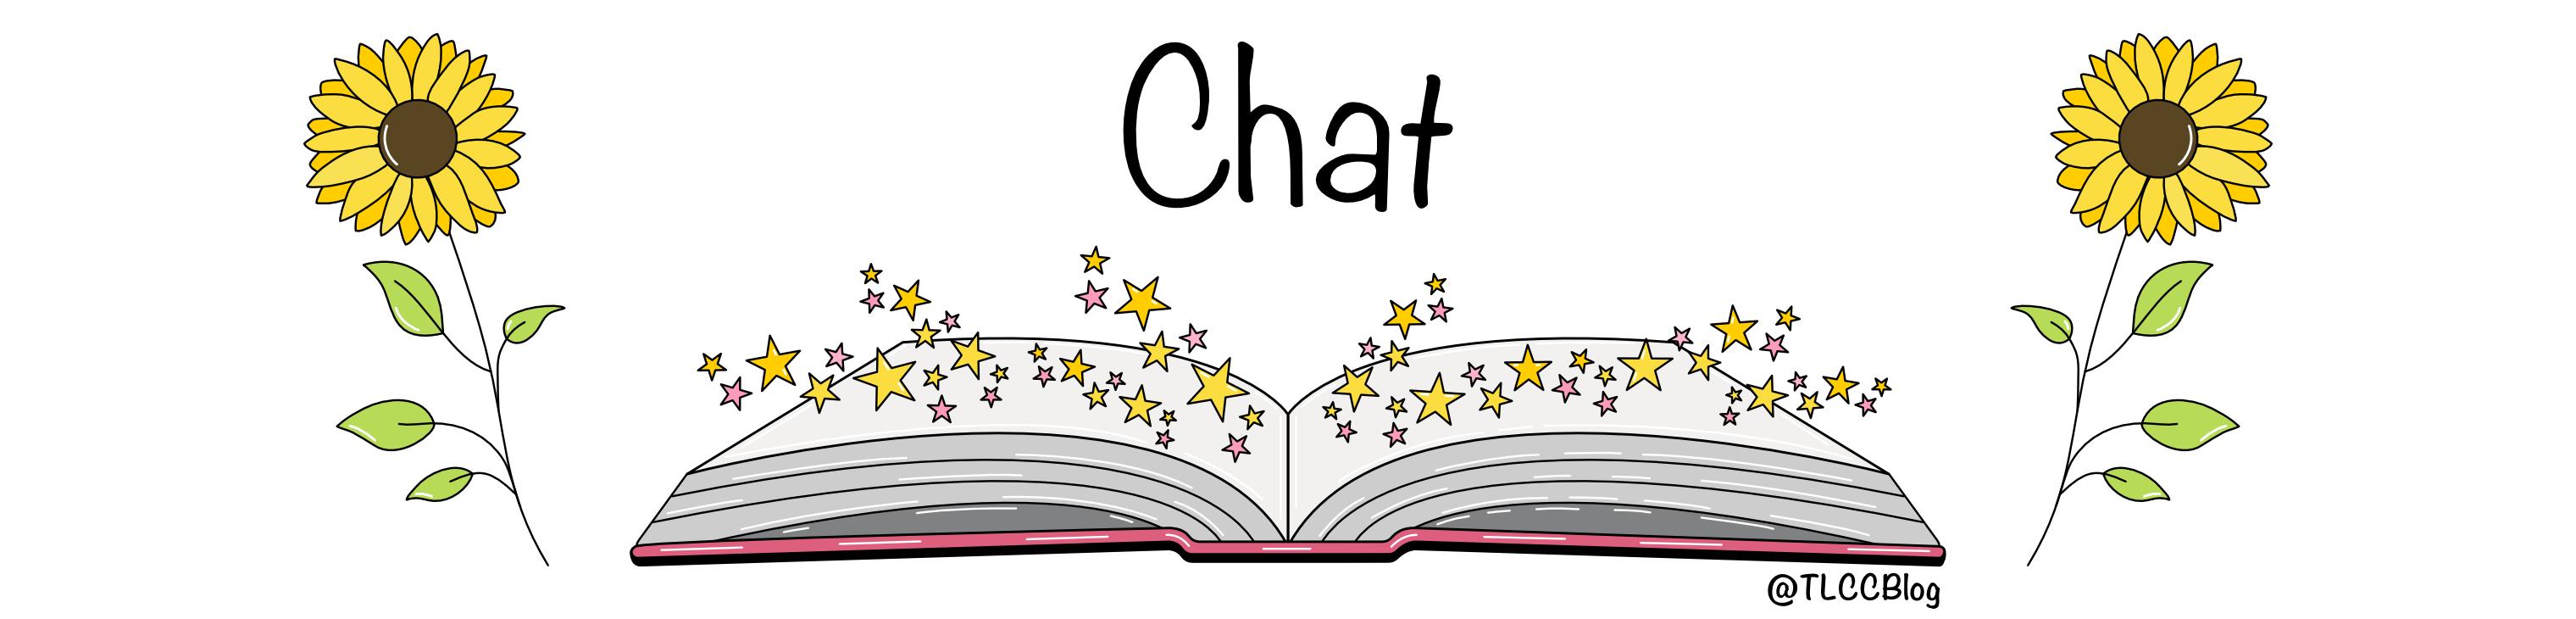 Chat Header